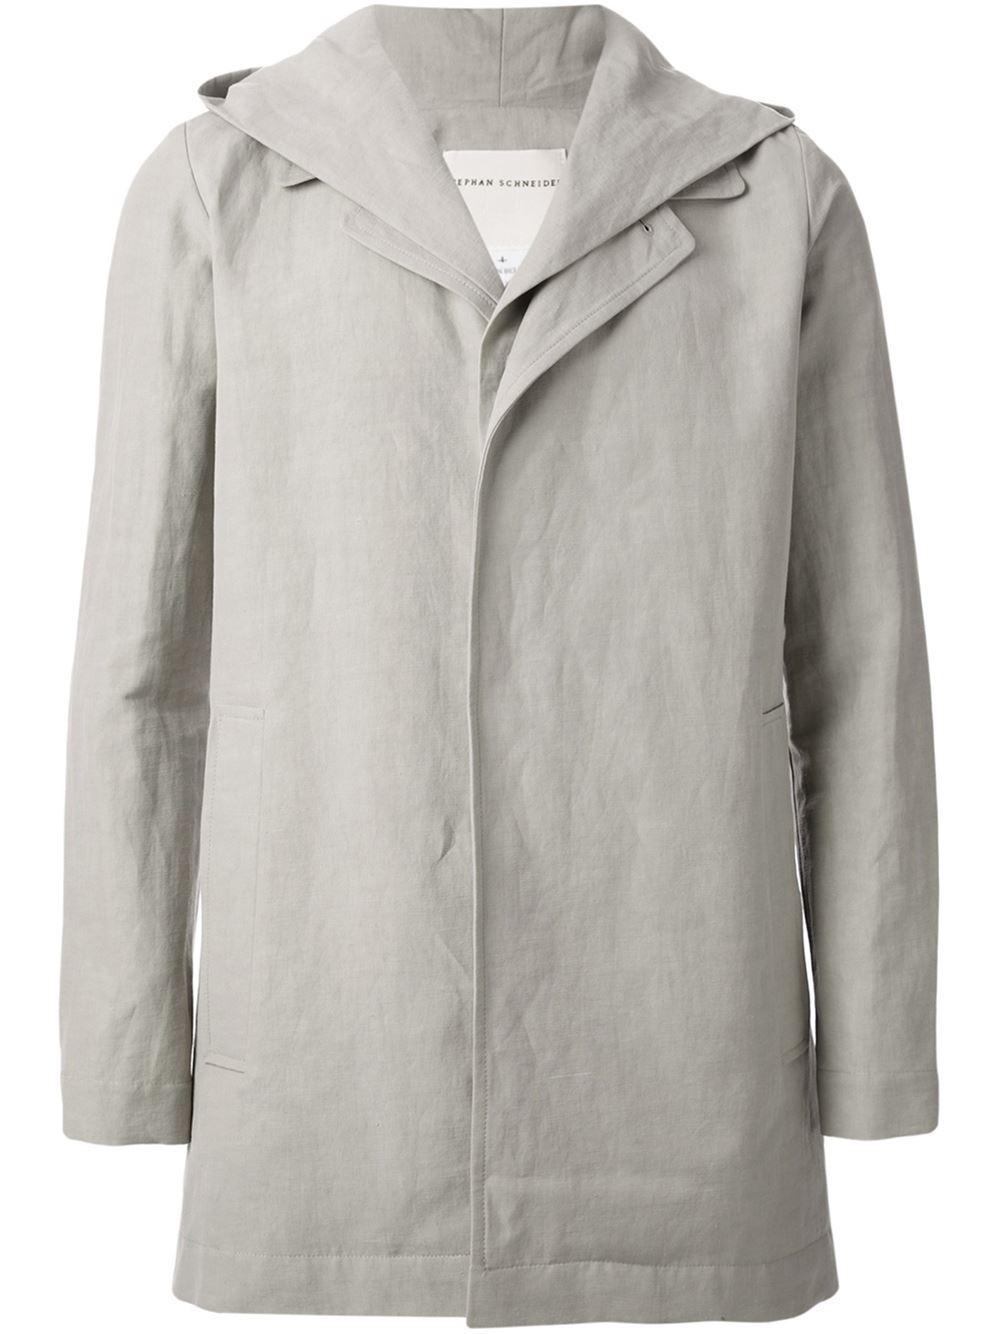 Stephan schneider Long Hooded Jacket in Gray for Men (grey ...